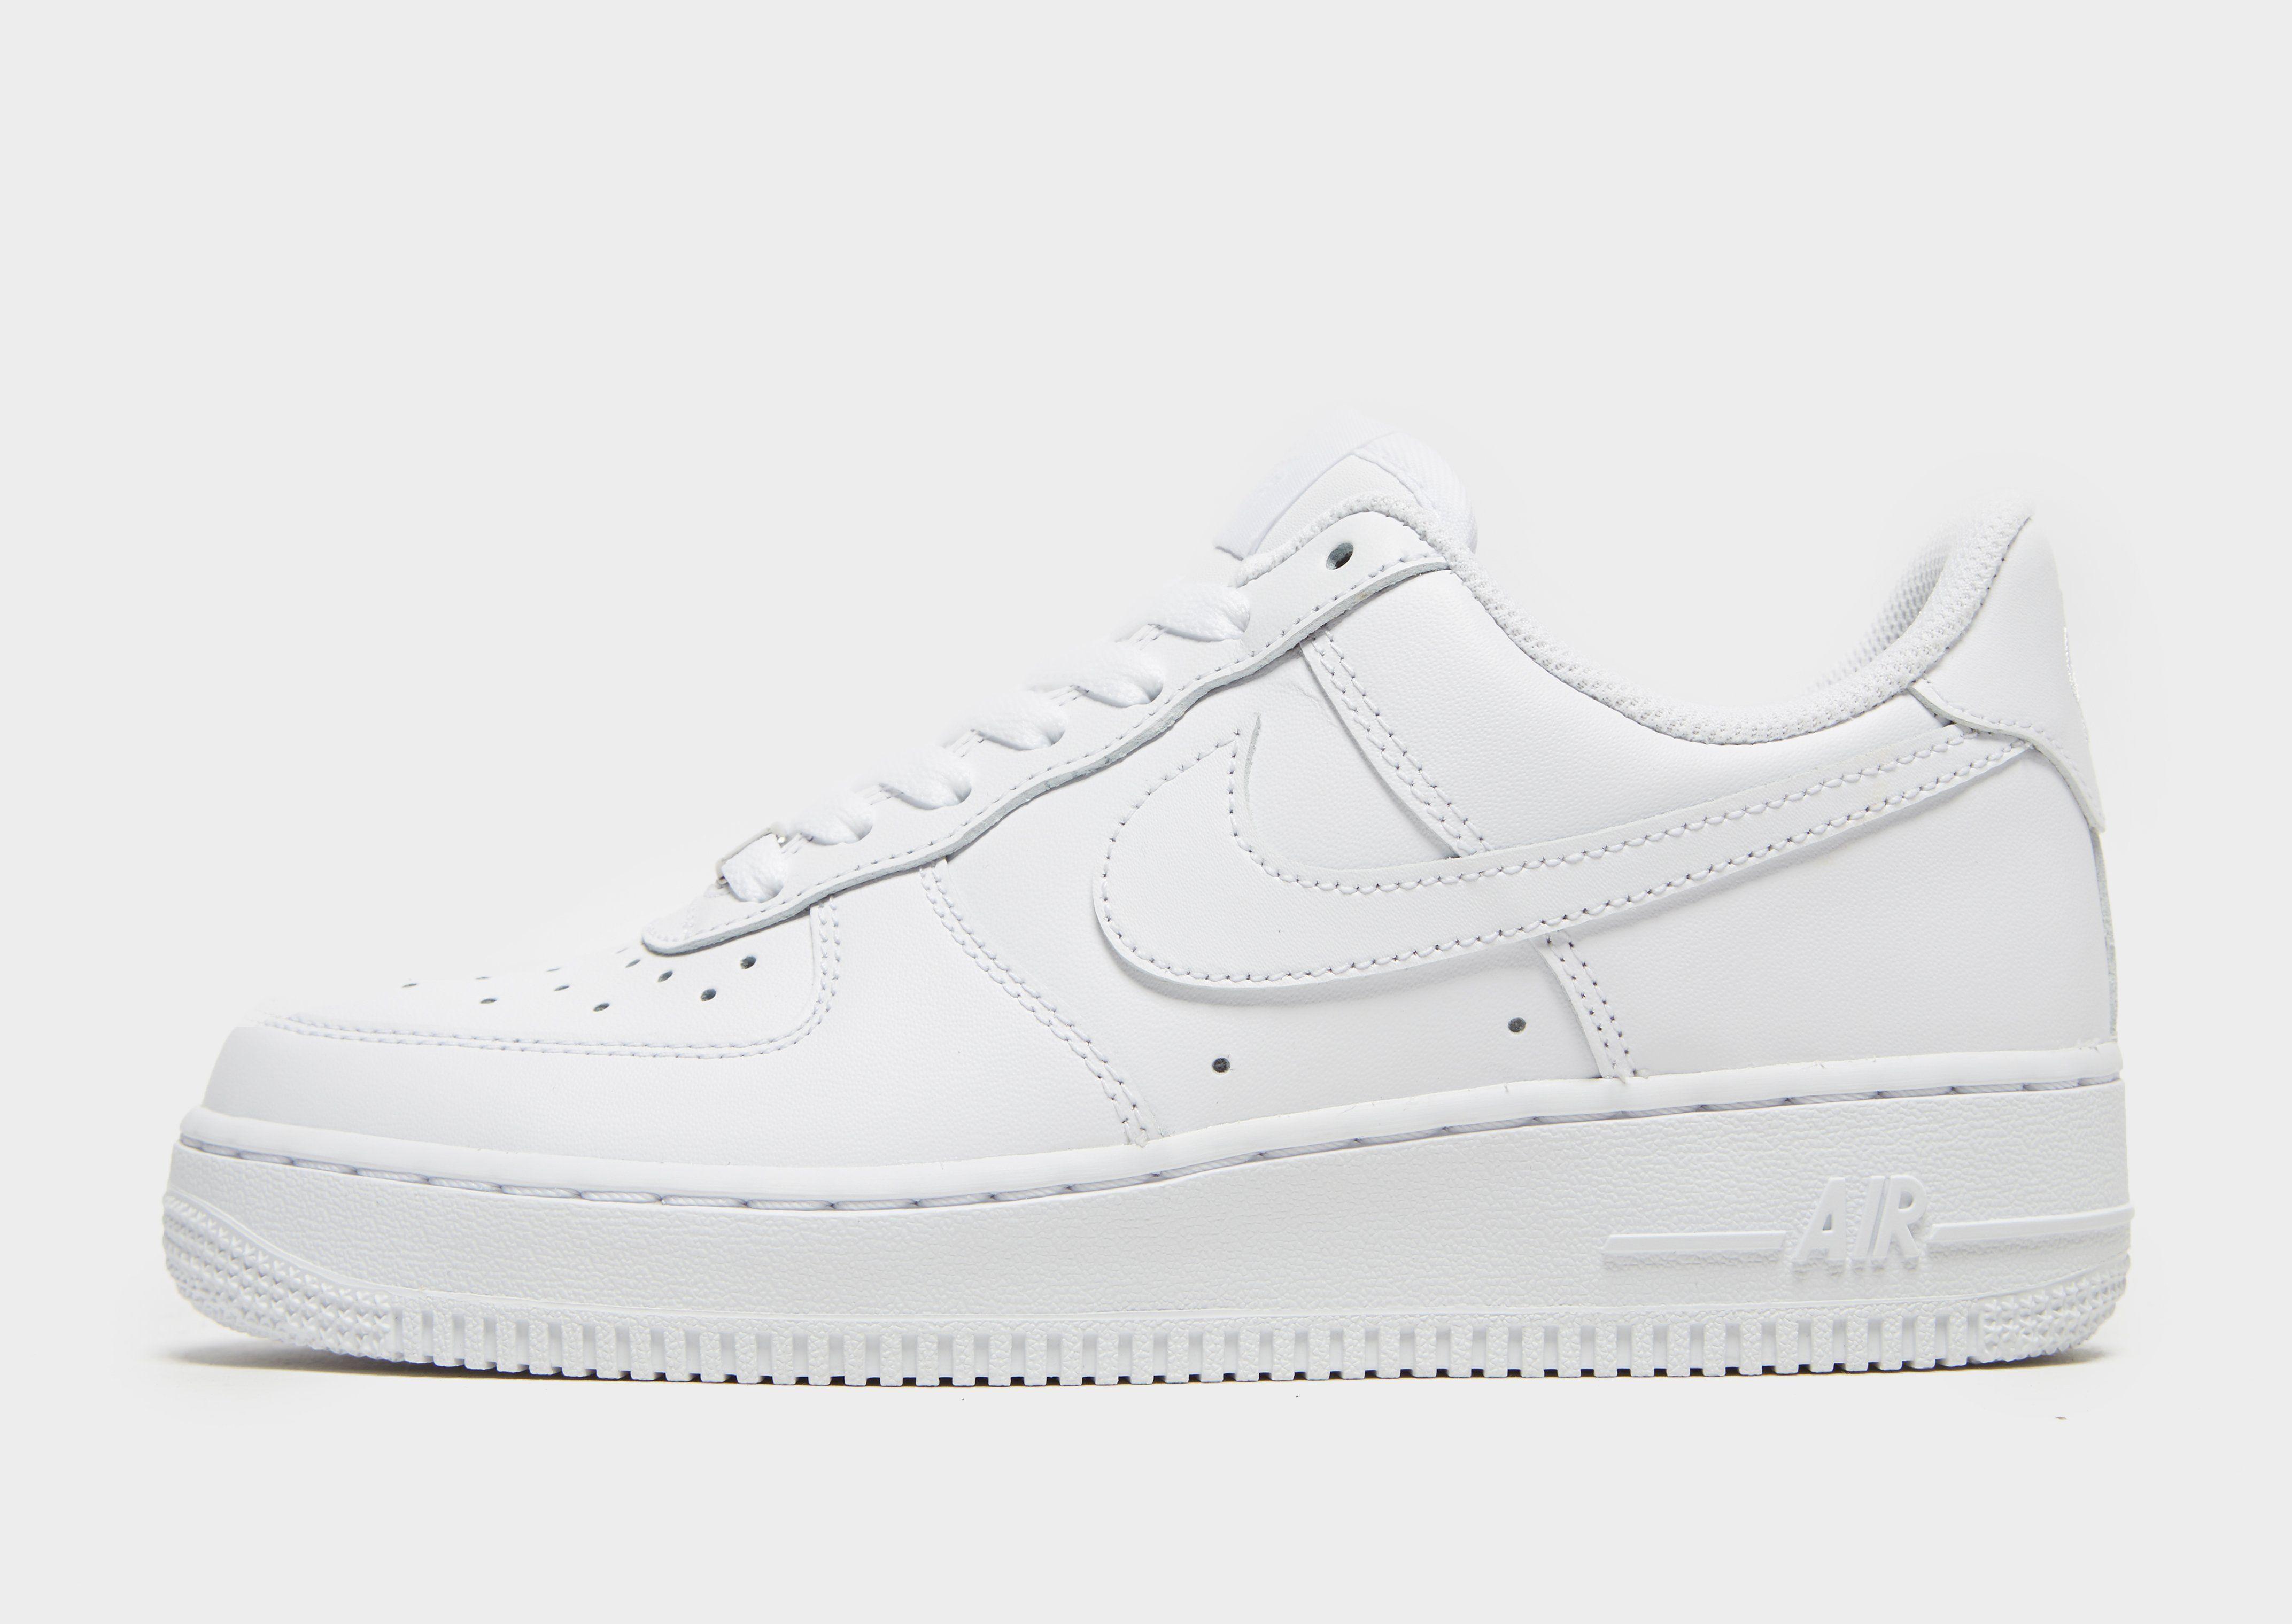 Compra Nike Air Force 1 Lo para mujer | Nike air force, Nike